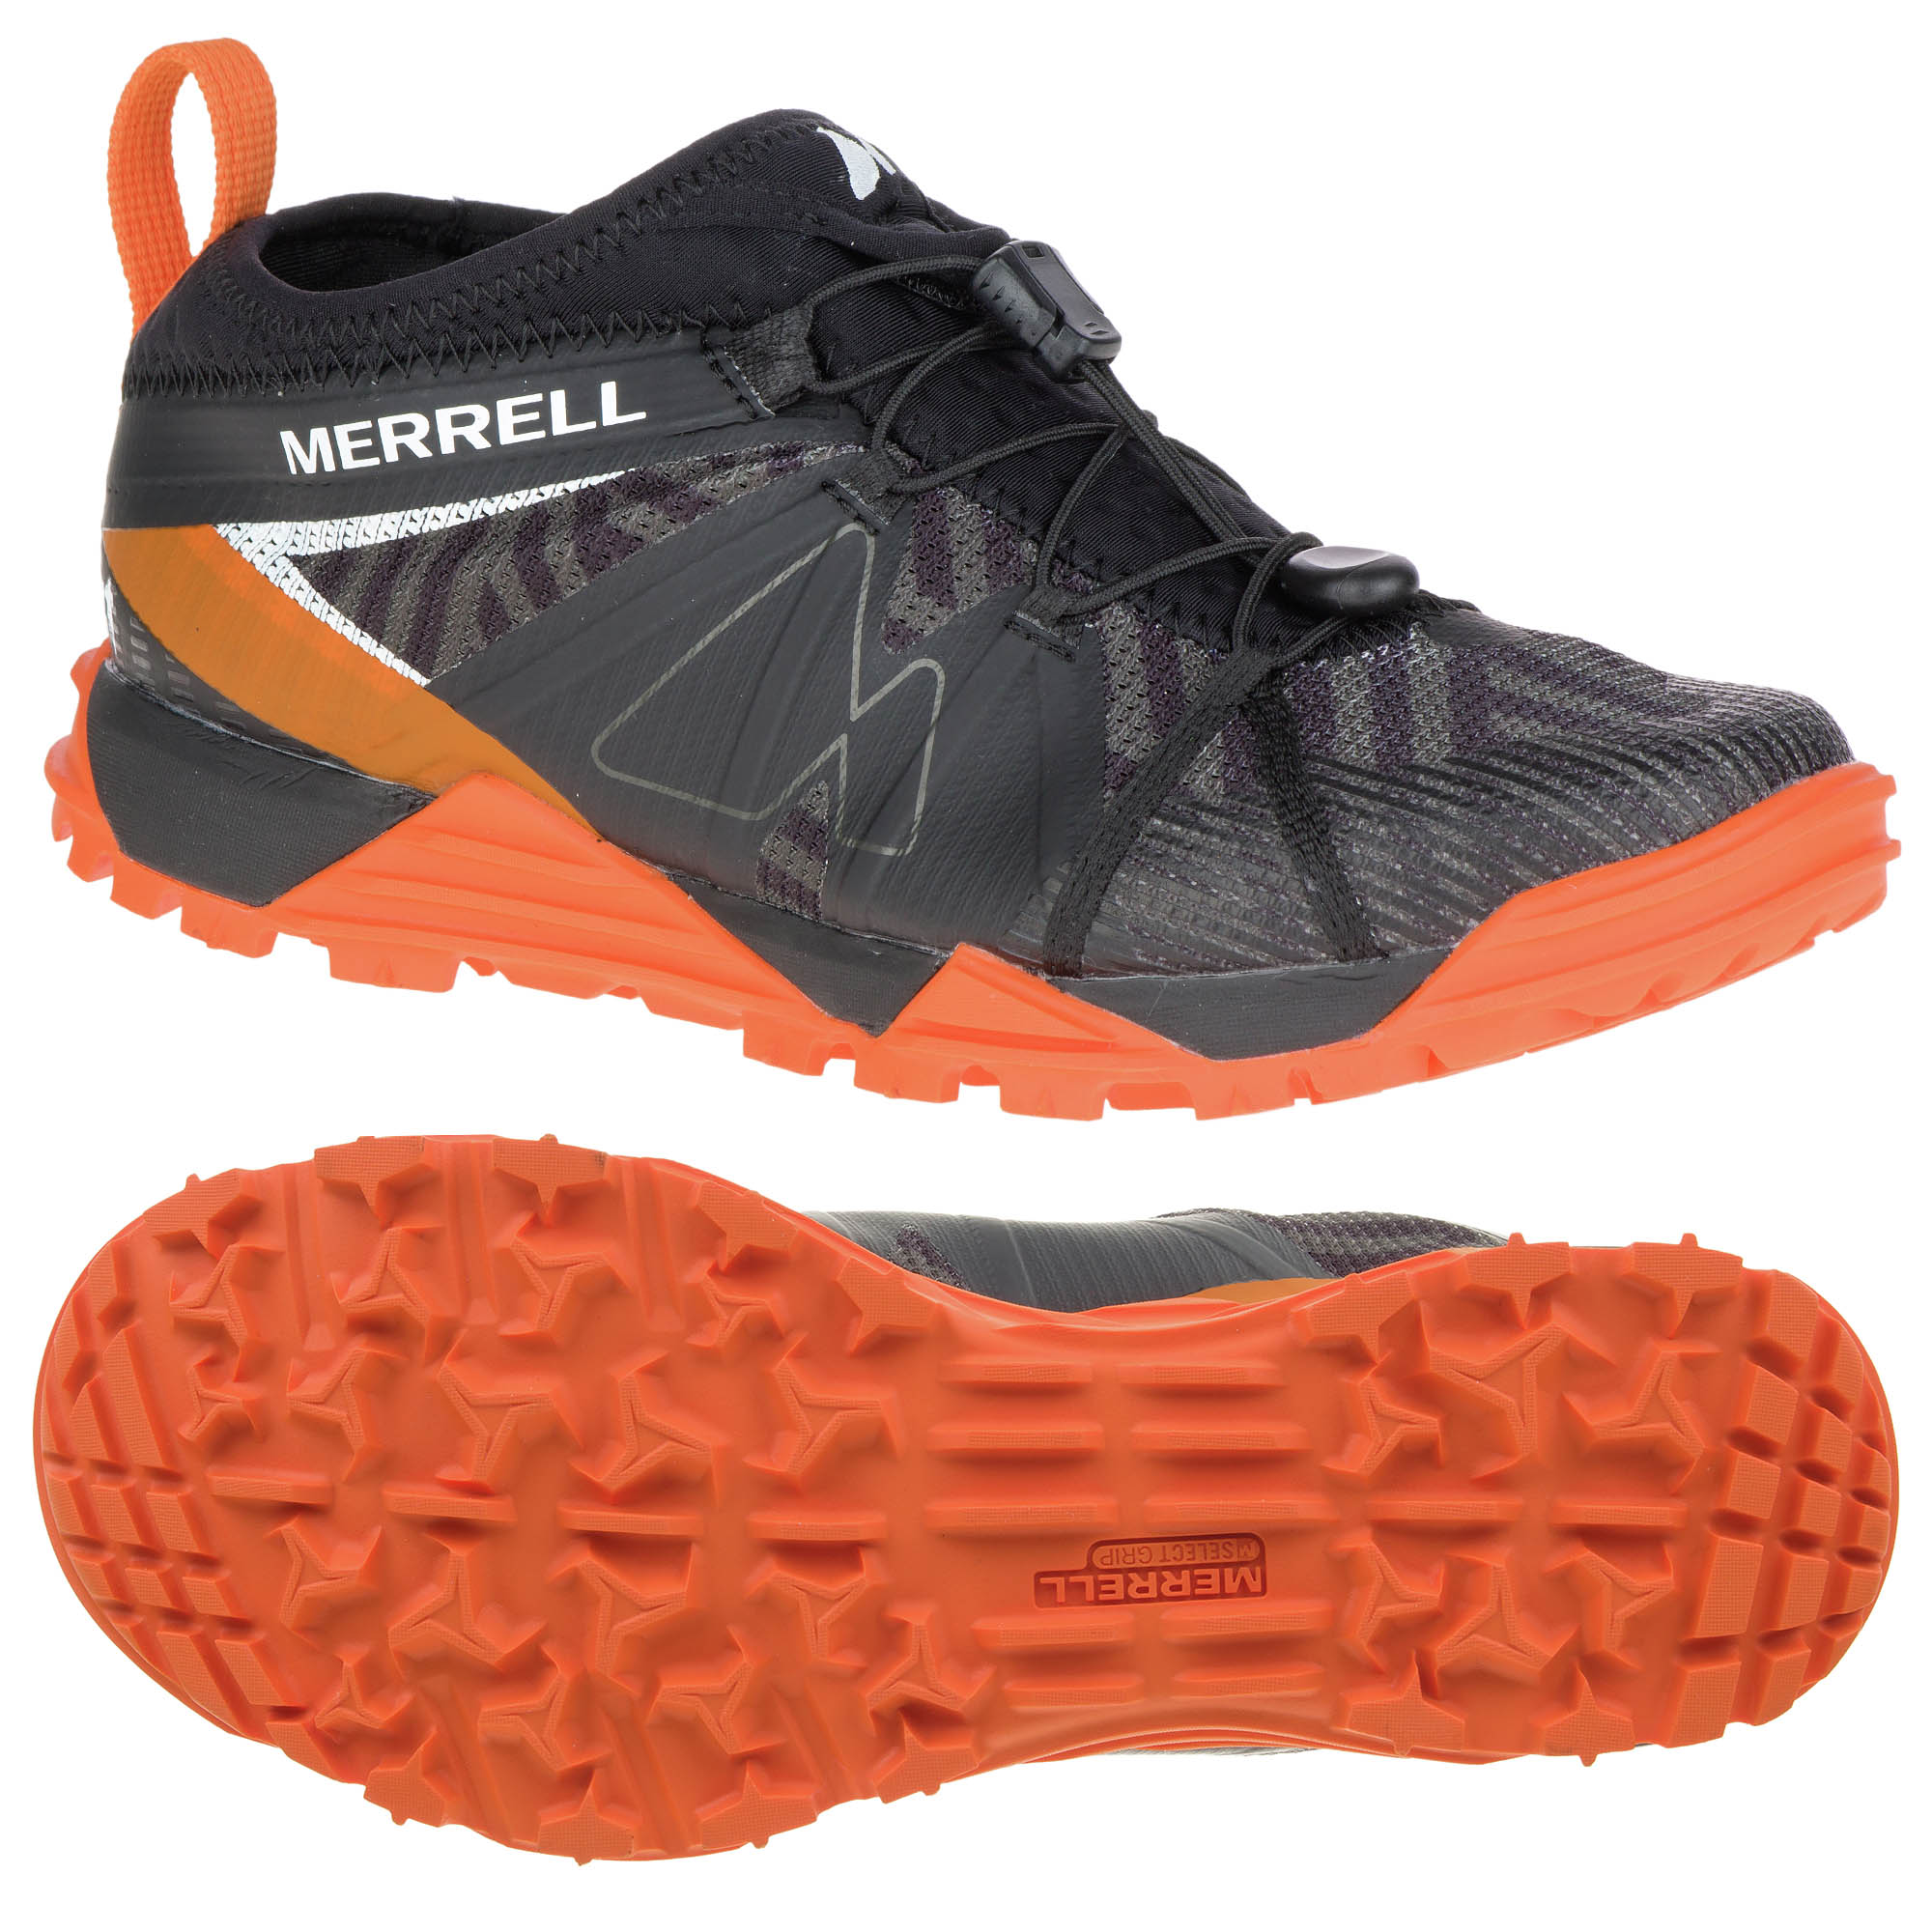 Merrell Avalaunch Tough Mudder Ladies Running Shoes  7 UK